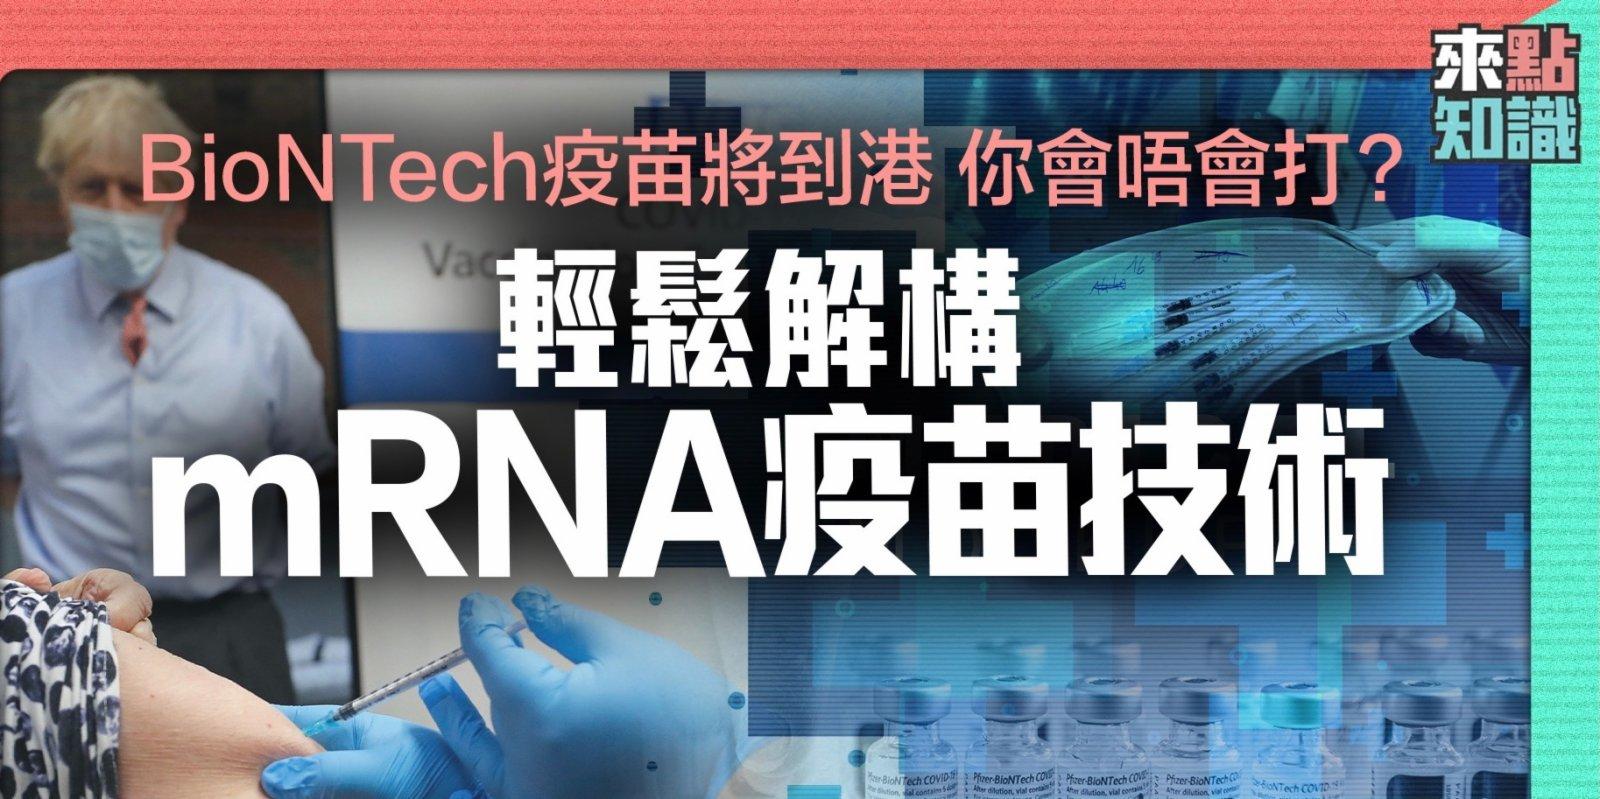 BioNTech疫苗將到港 你會唔會打?輕鬆解構mRNA疫苗技術【來點知識EP4】